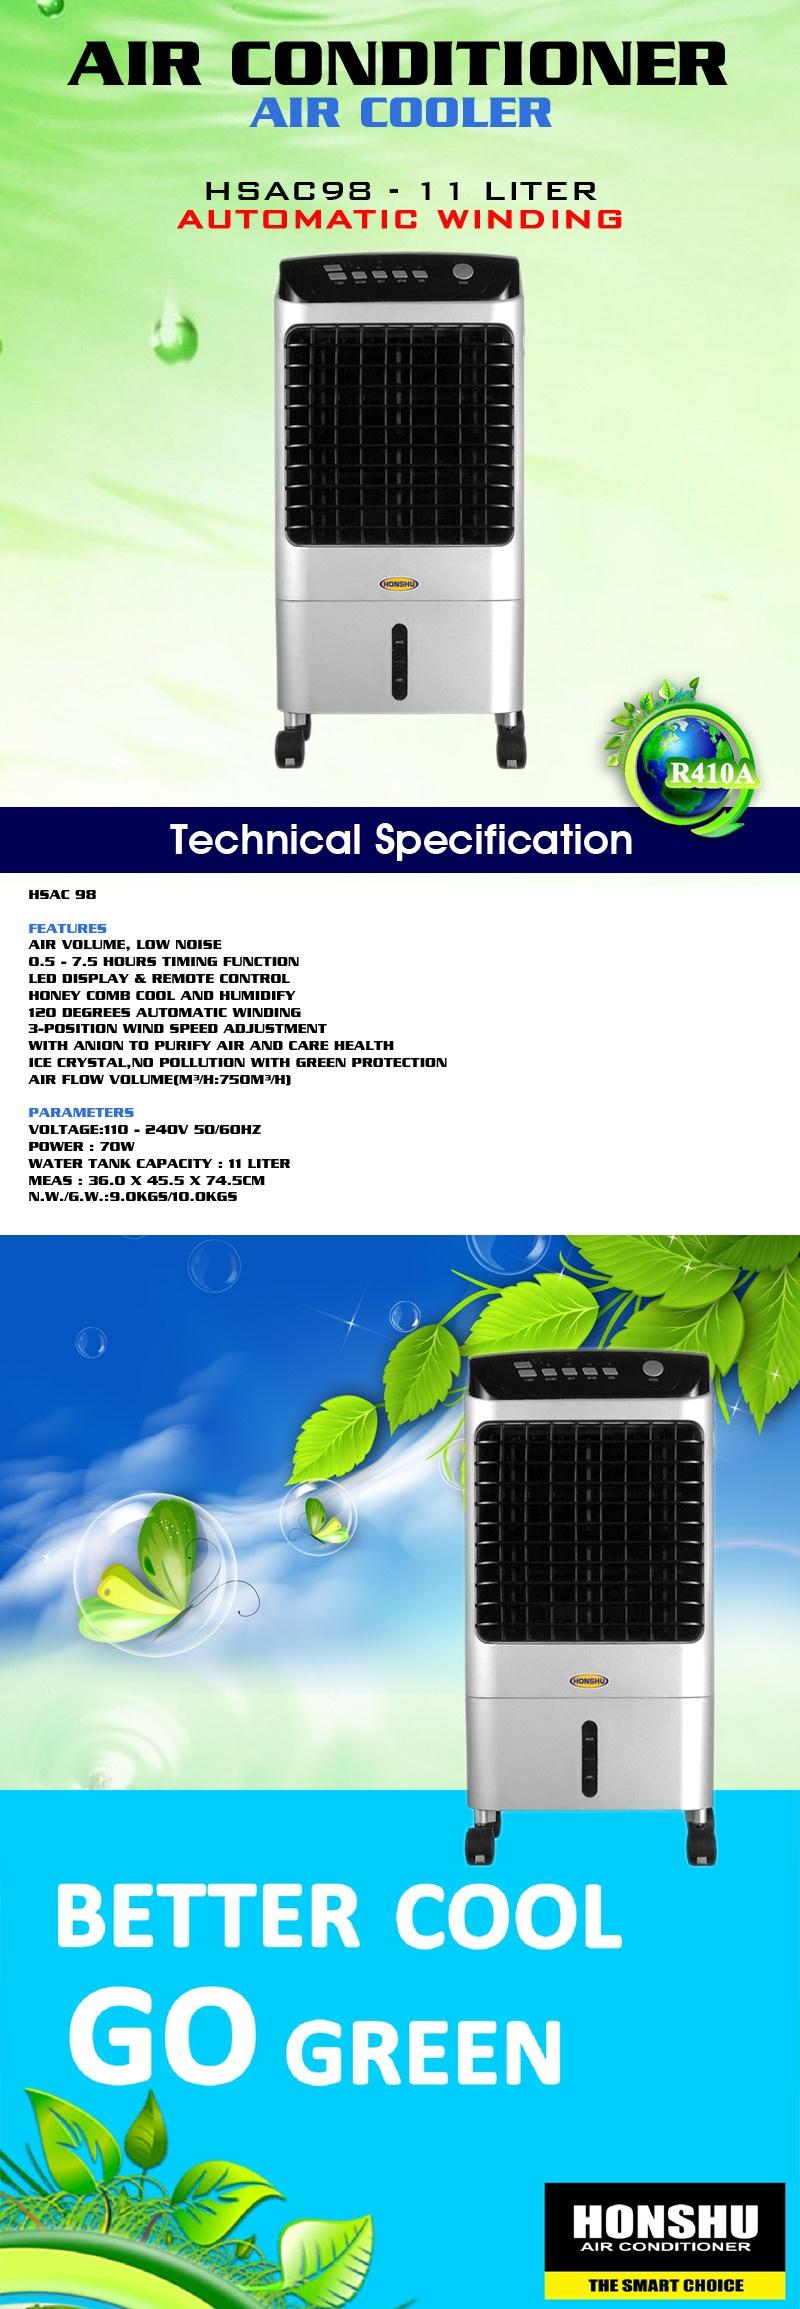 Daftar Harga Honshu Air Cooler Hsac98 11 Liter Flash Sale Sanyo Ref B130